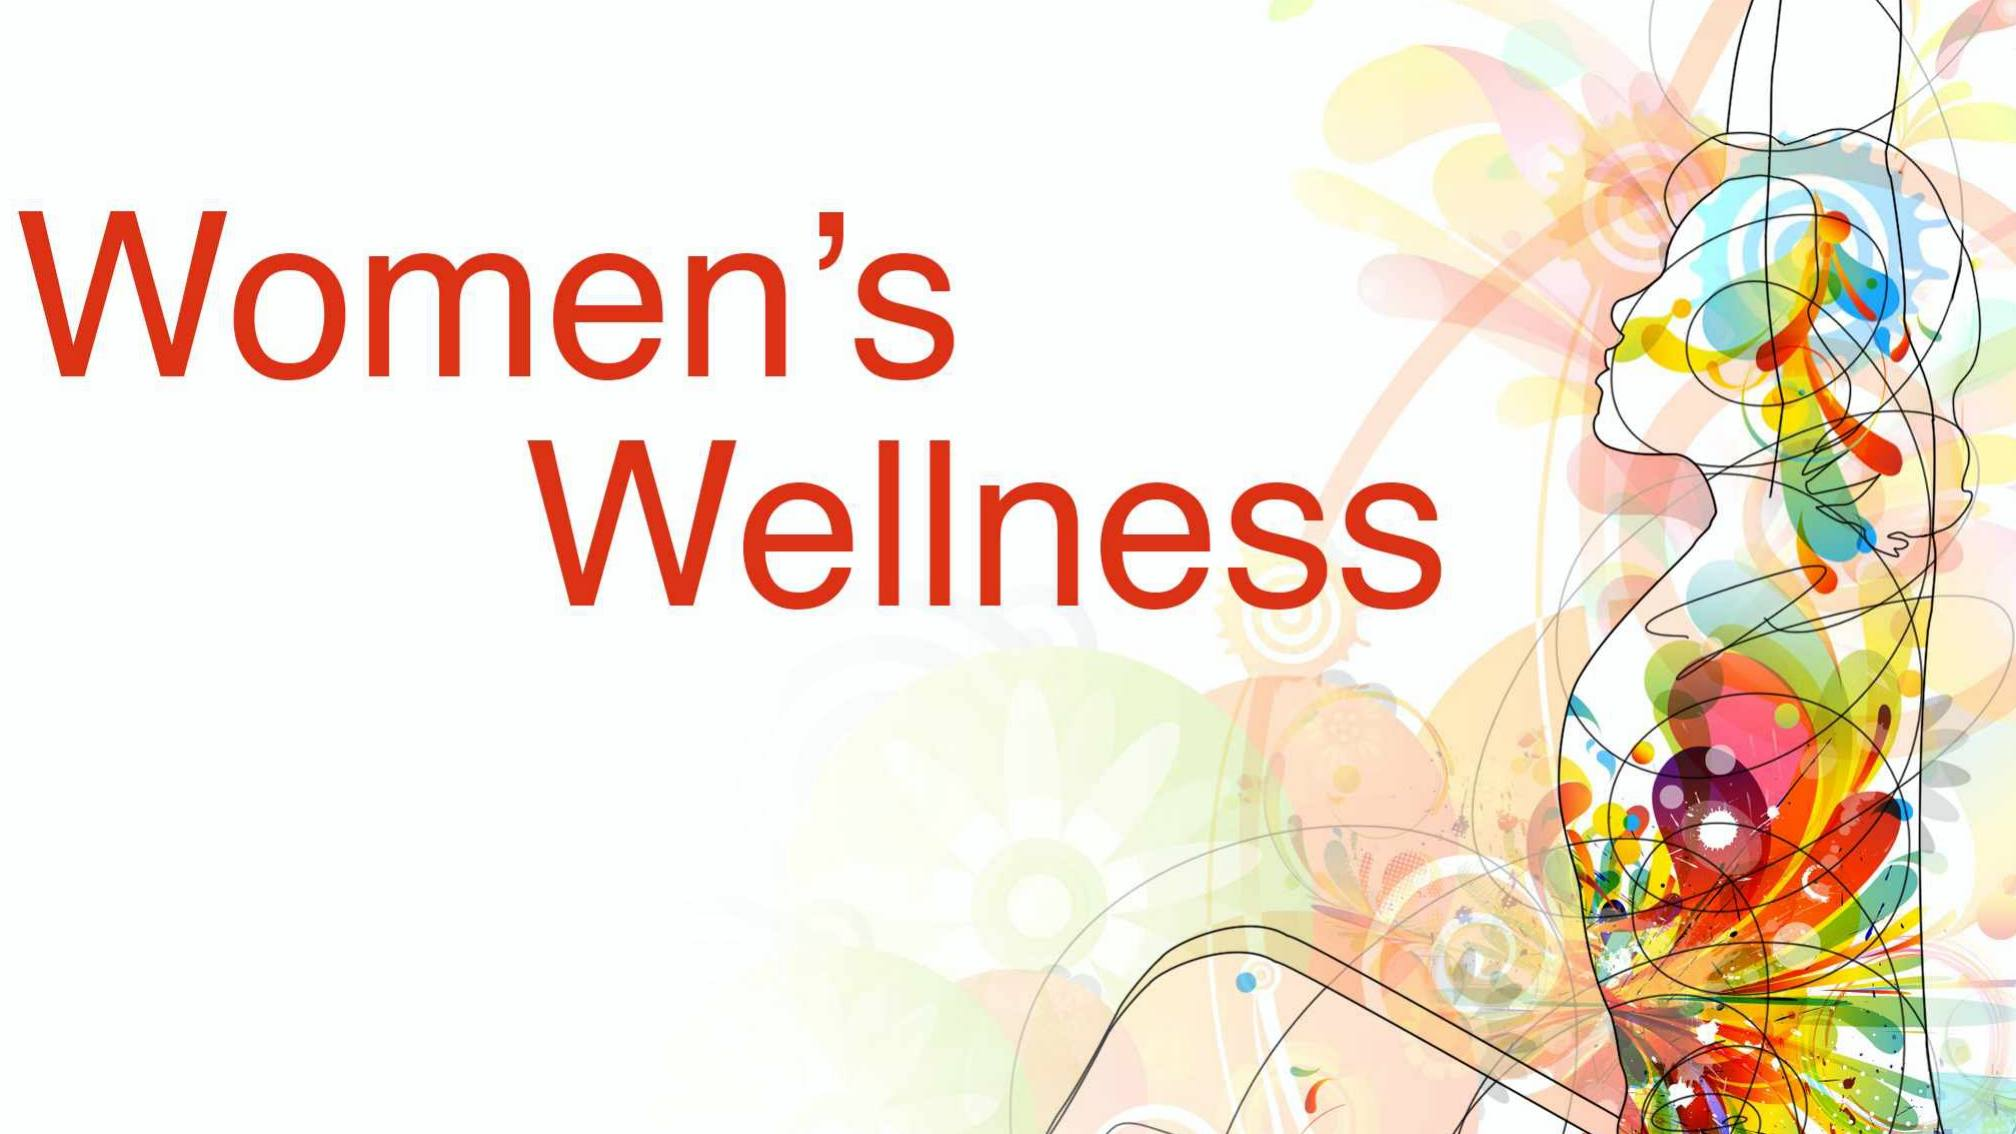 Women's Wellness: Bladder control problems – Mayo Clinic